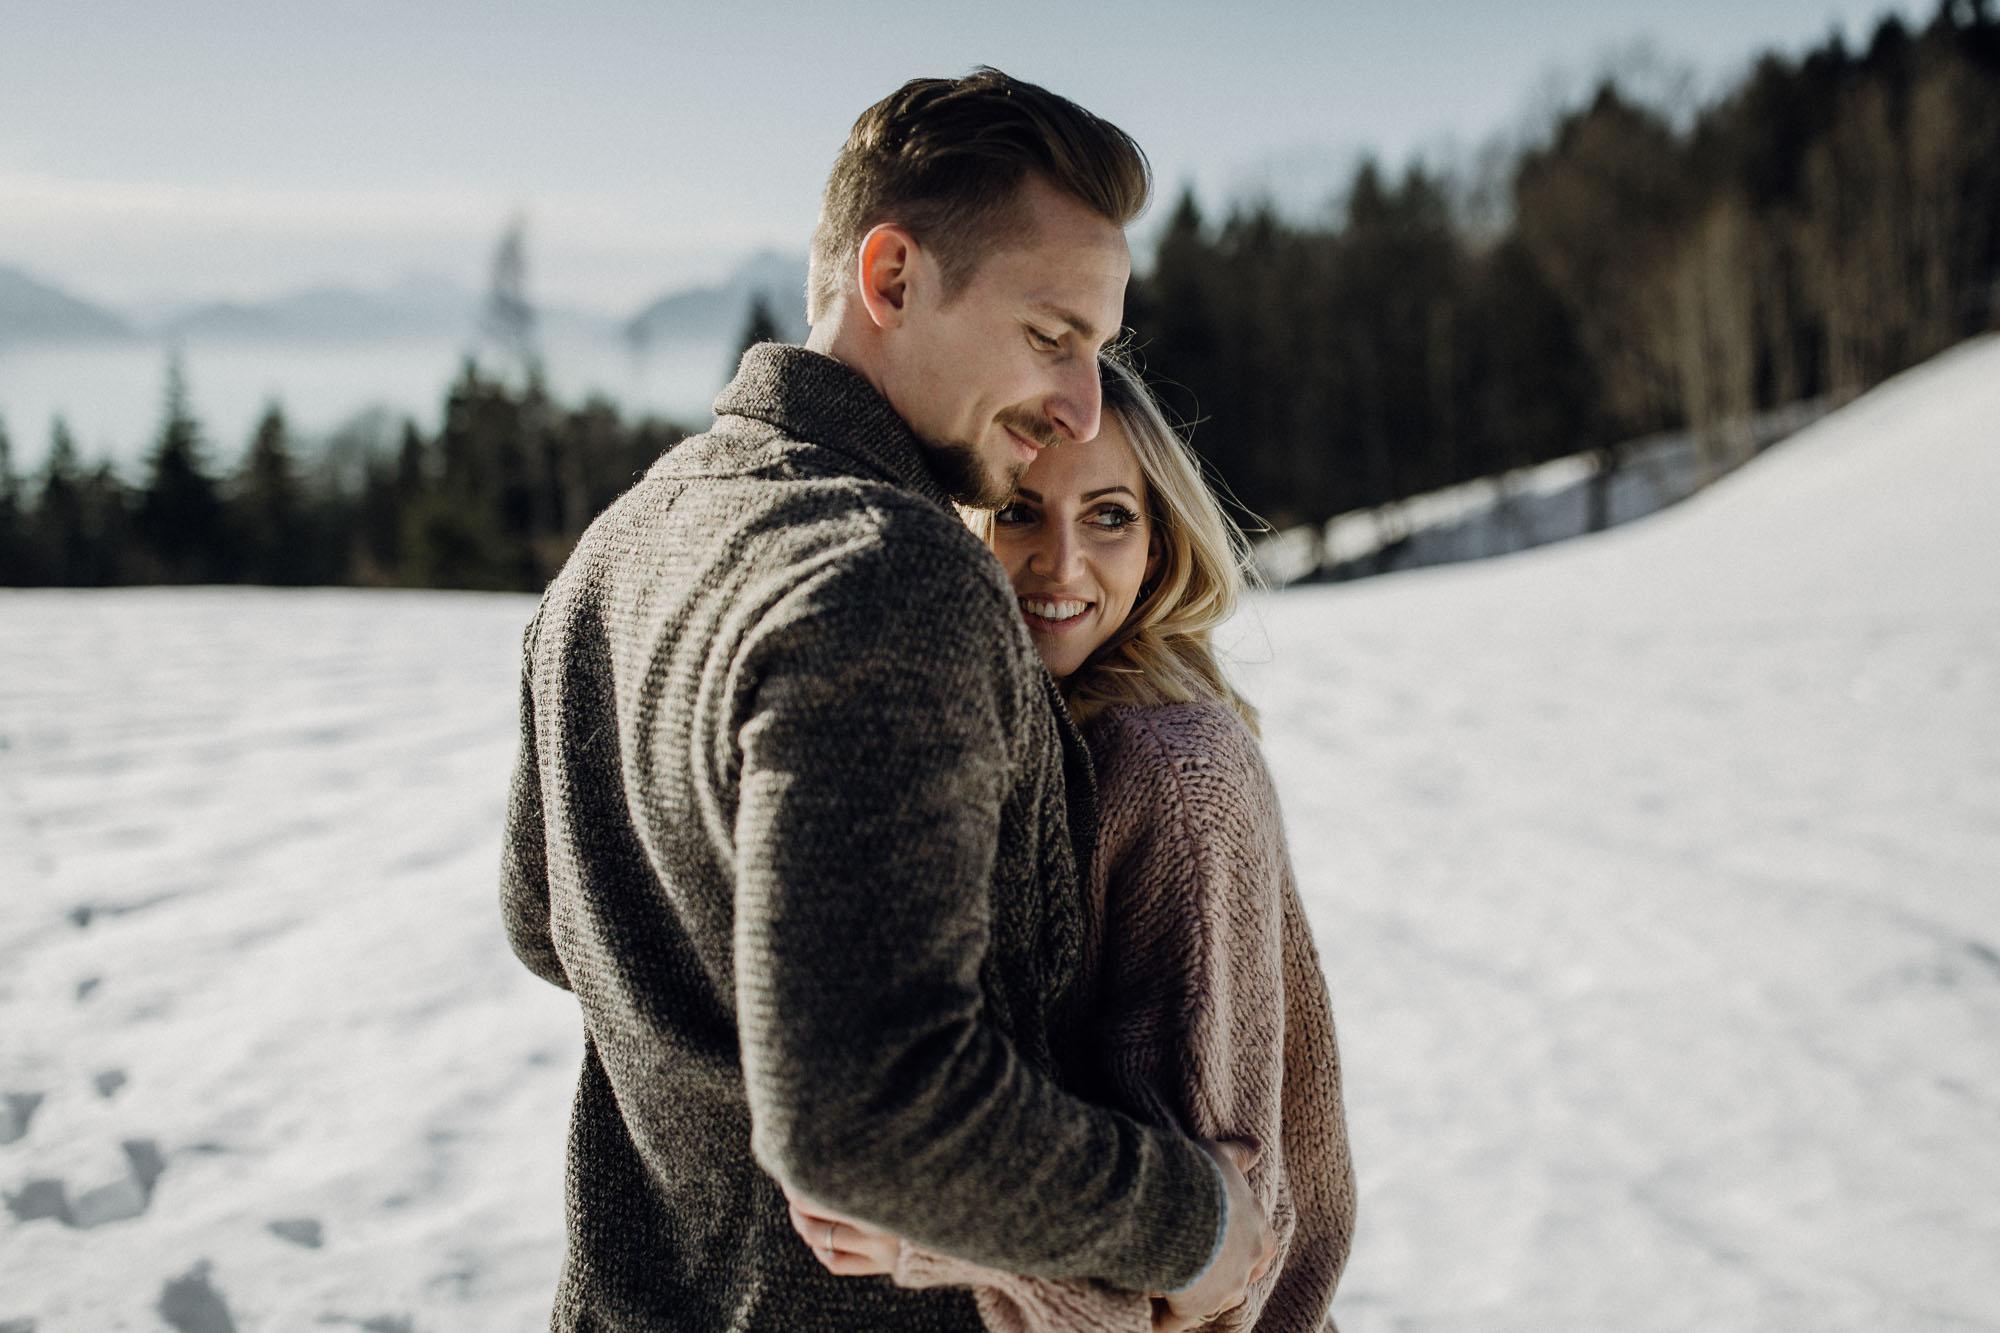 raissa simon photography destination couple munich salzburg 005 - Christina + Stefan